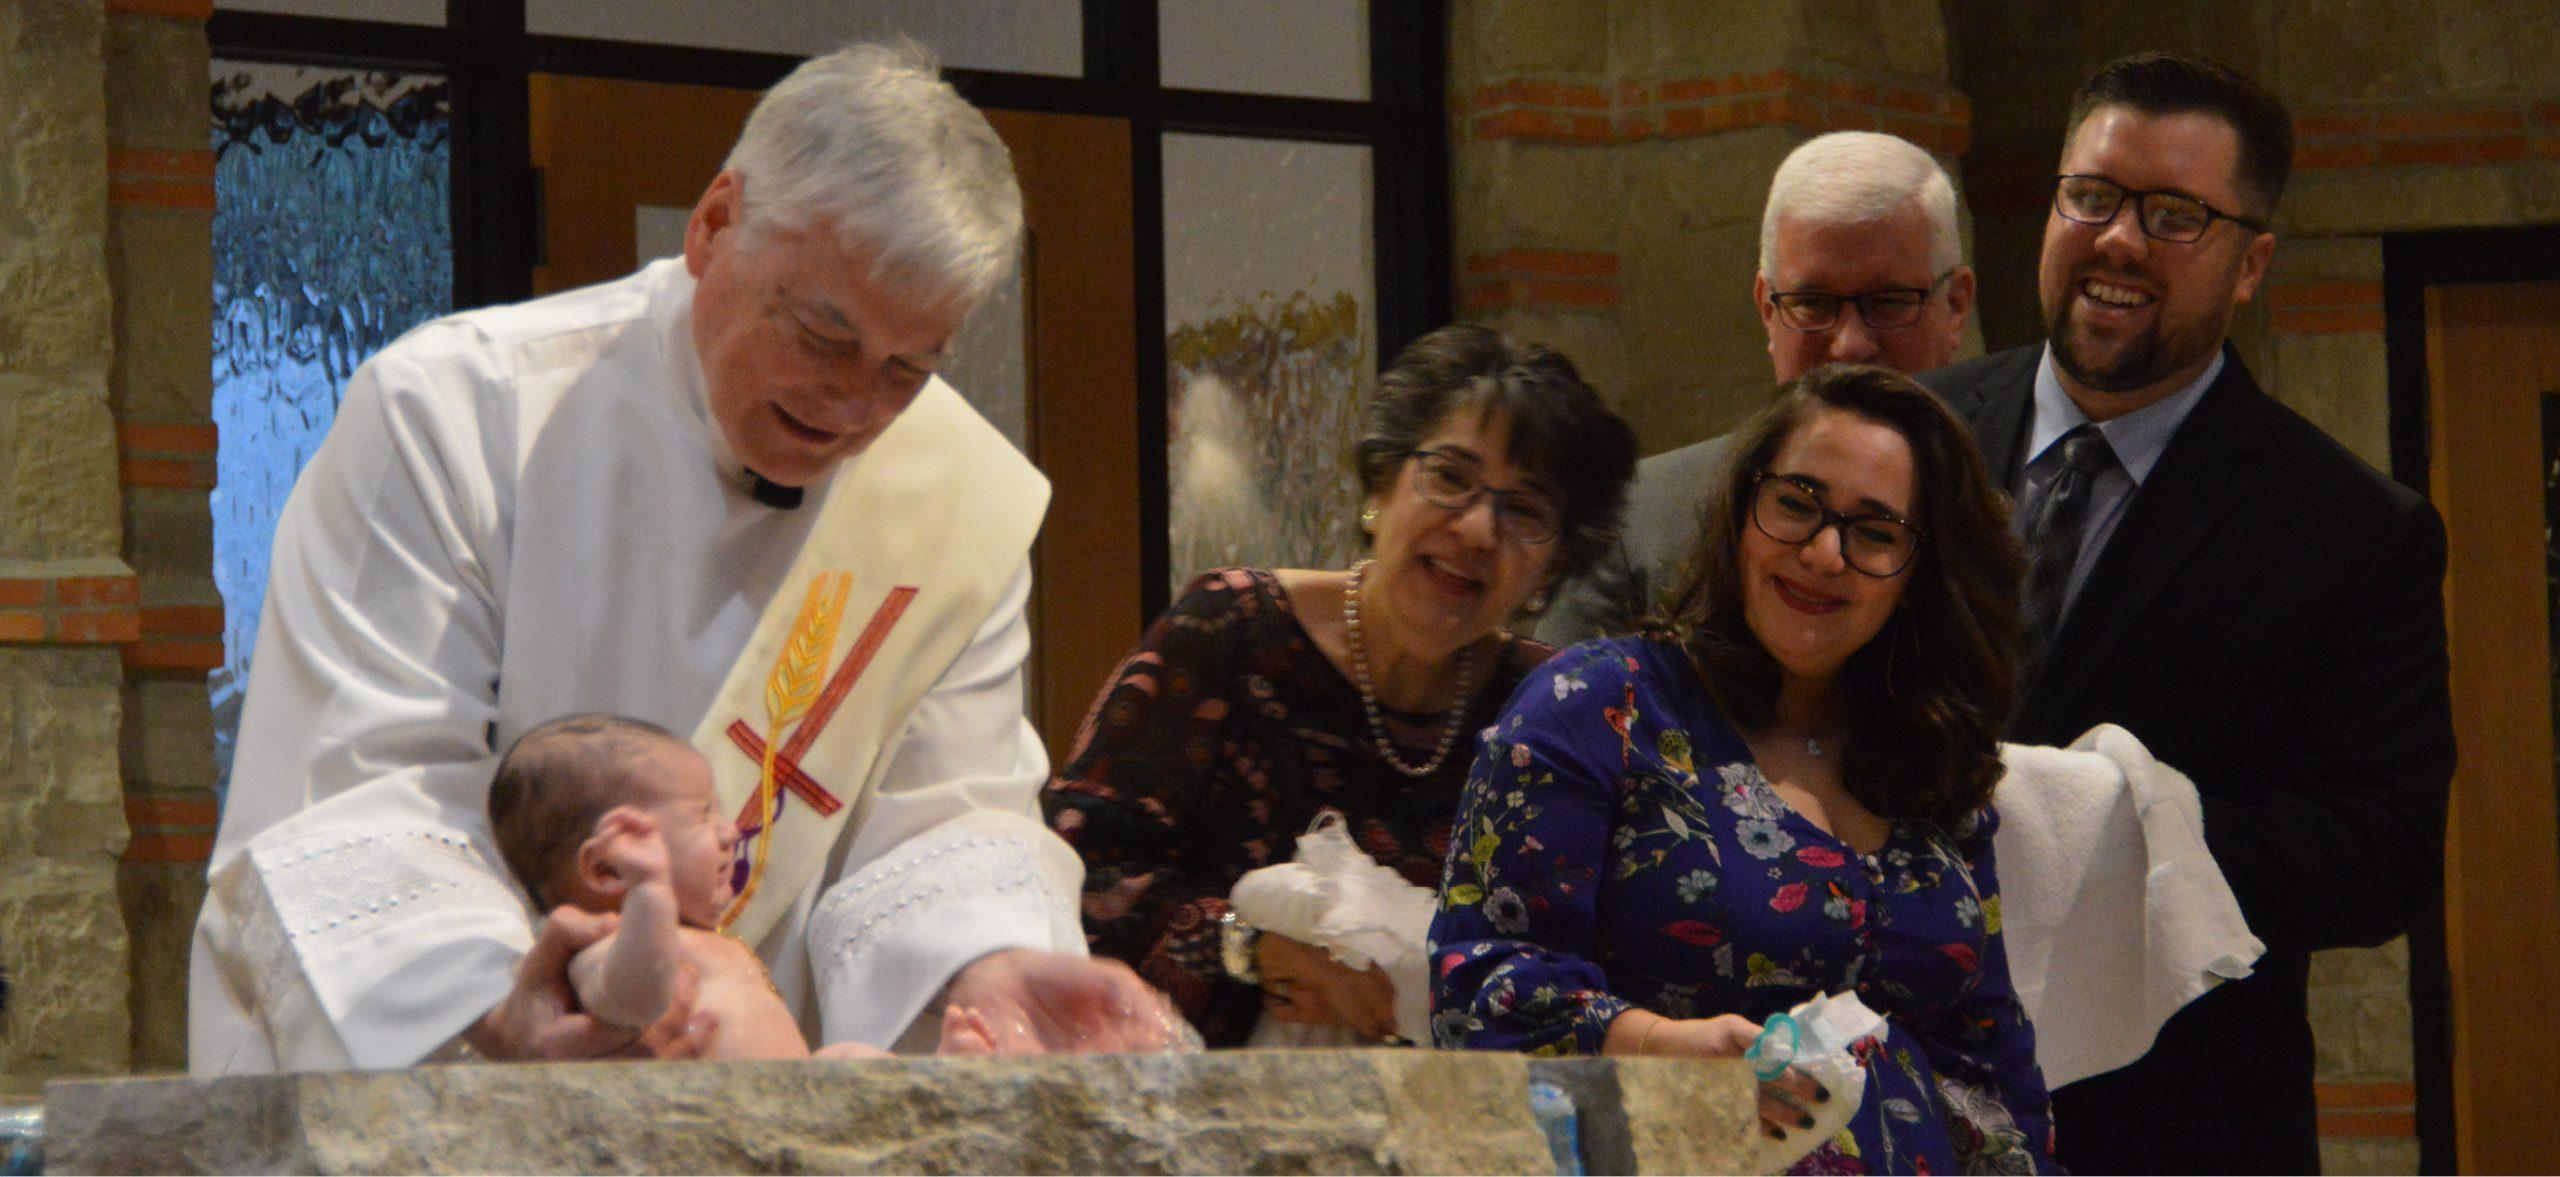 Deacon Jim Baptism with parents and godparents